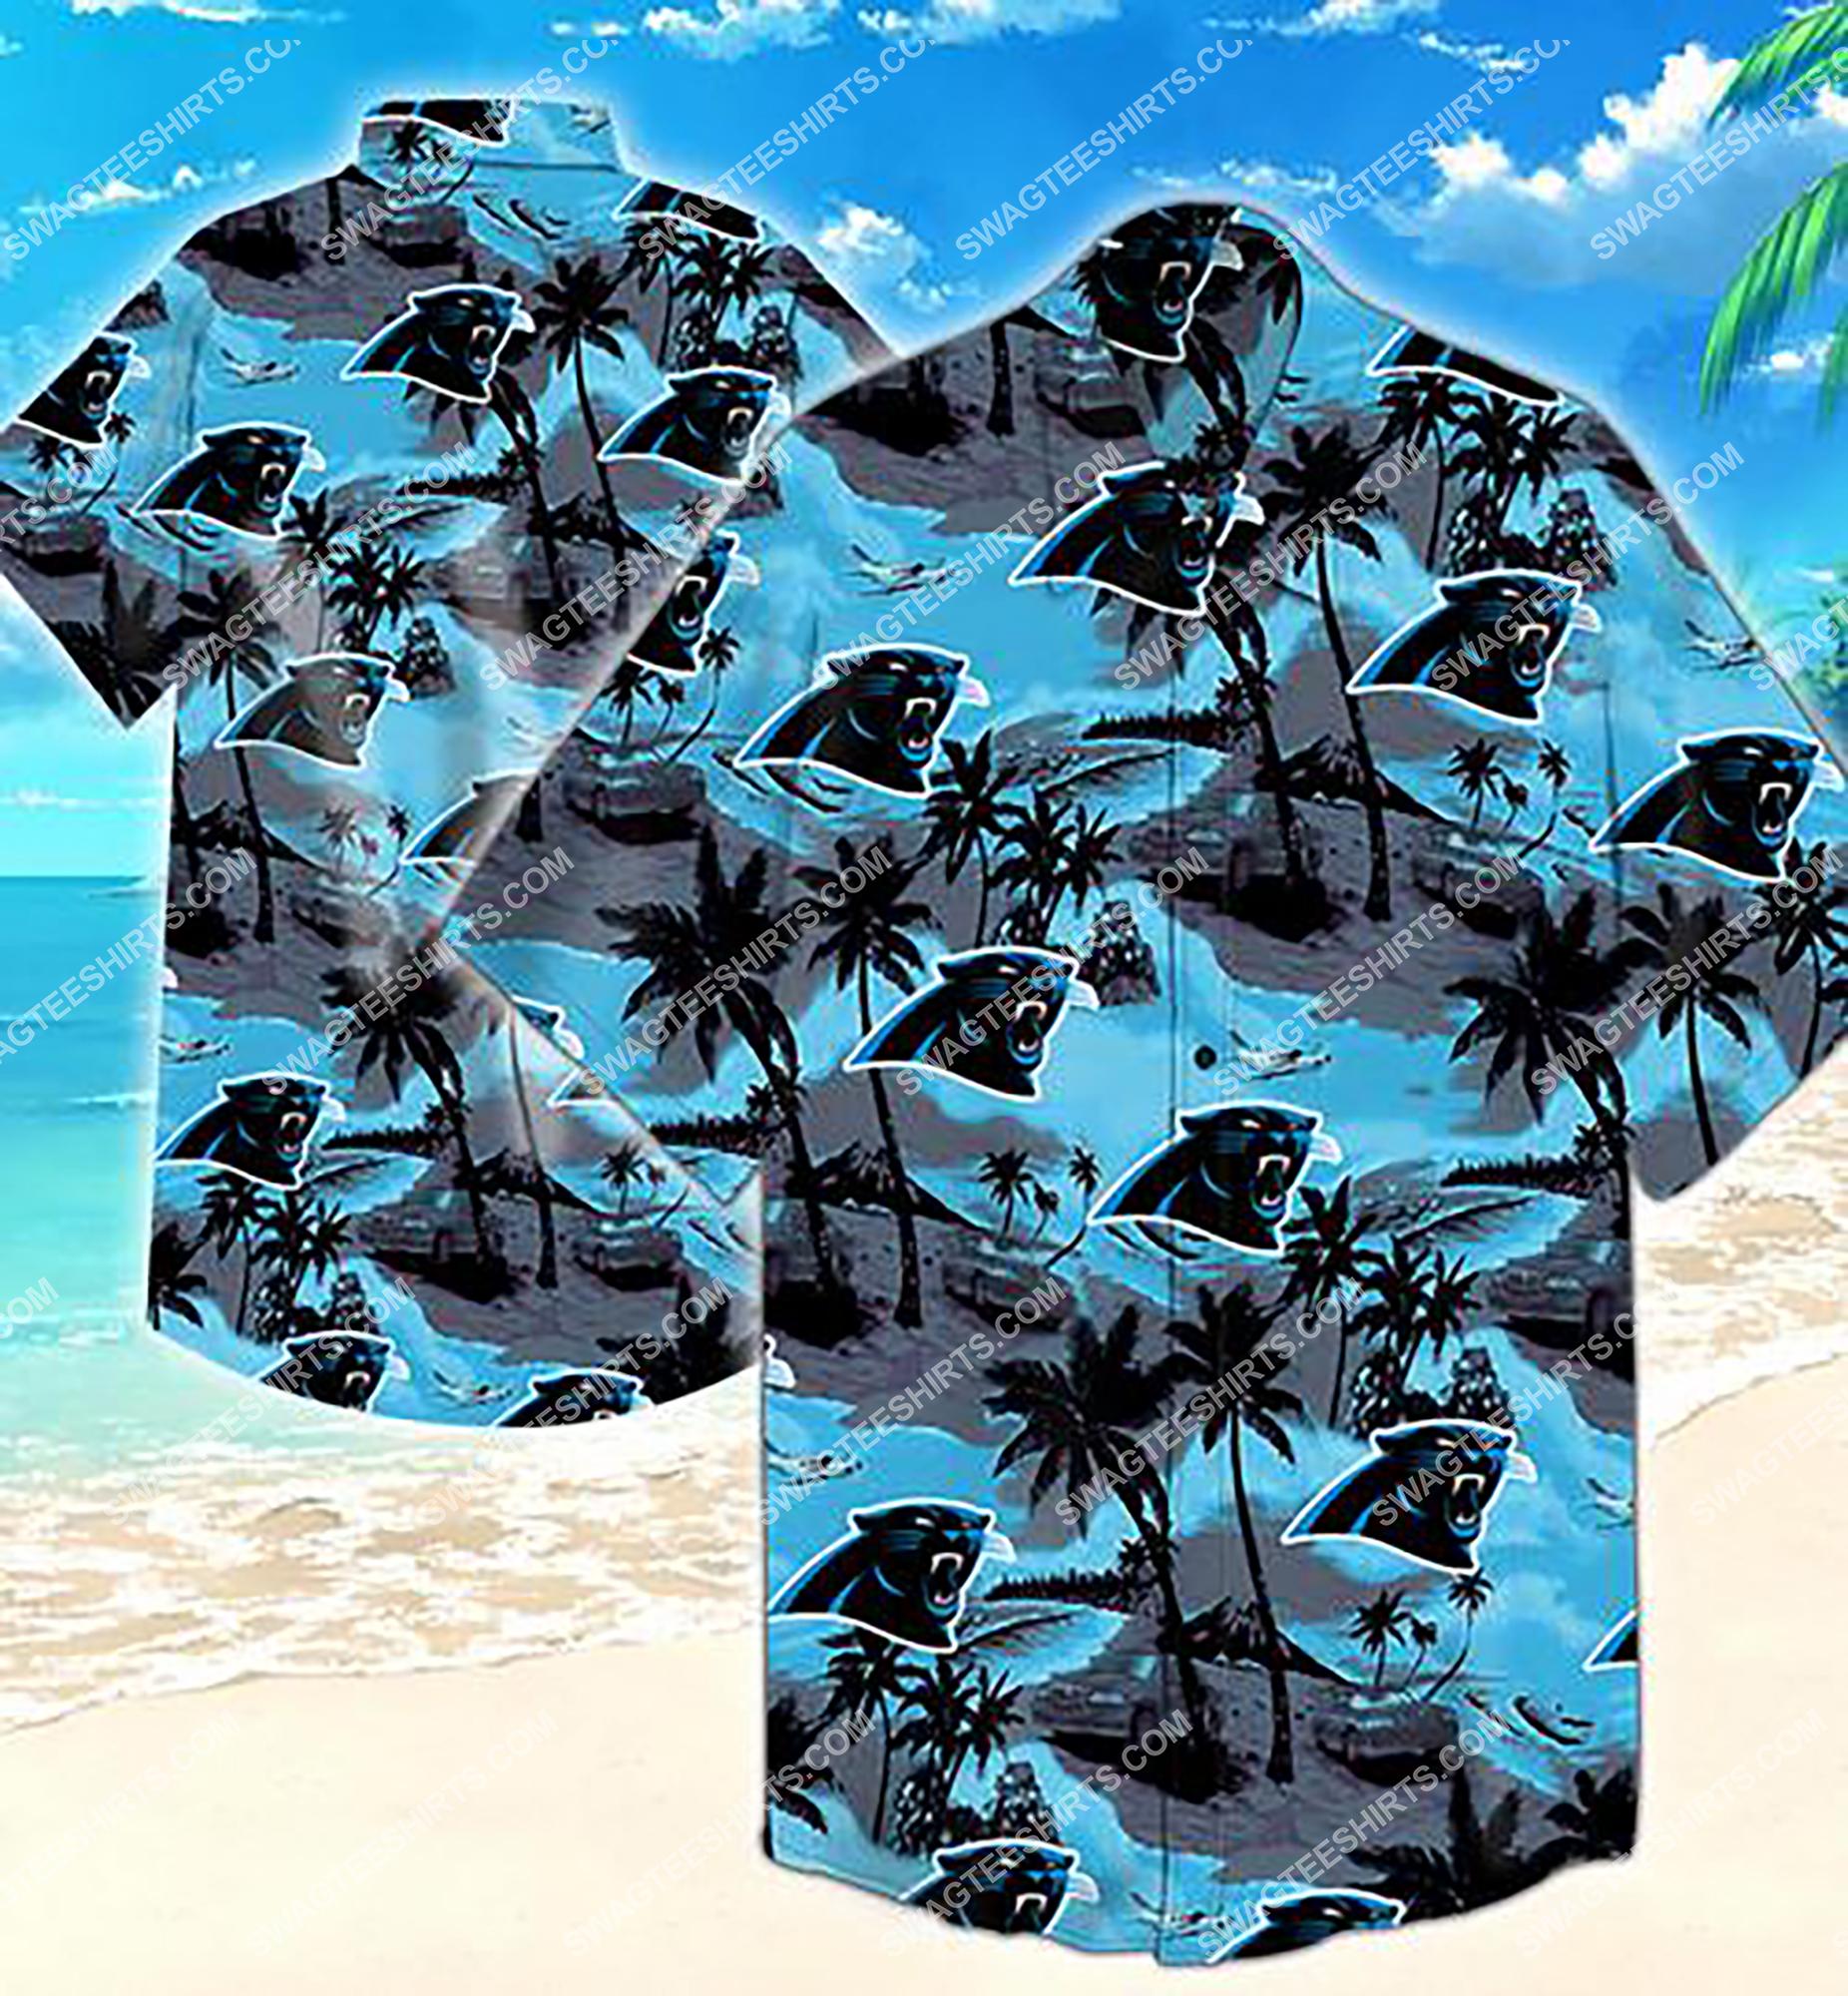 tropical flower carolina panthers team summer hawaiian shirt 2 - Copy (2)